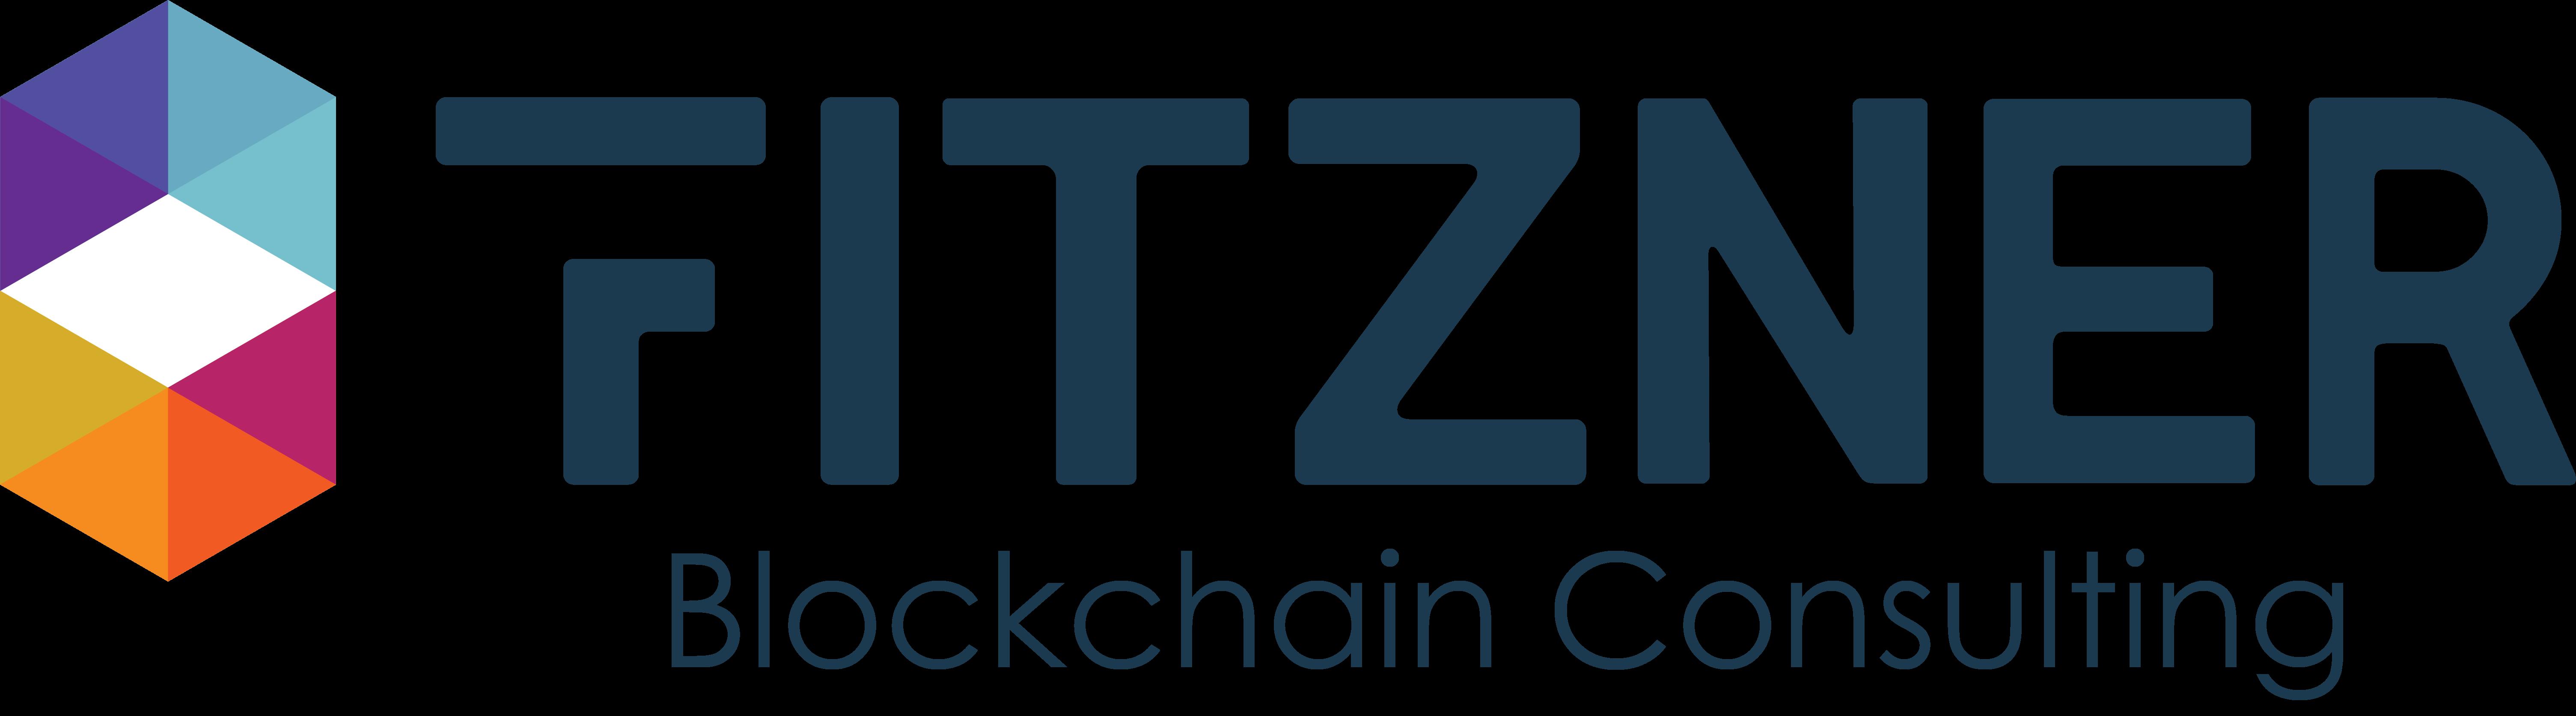 Fitzner Blockchain Consulting